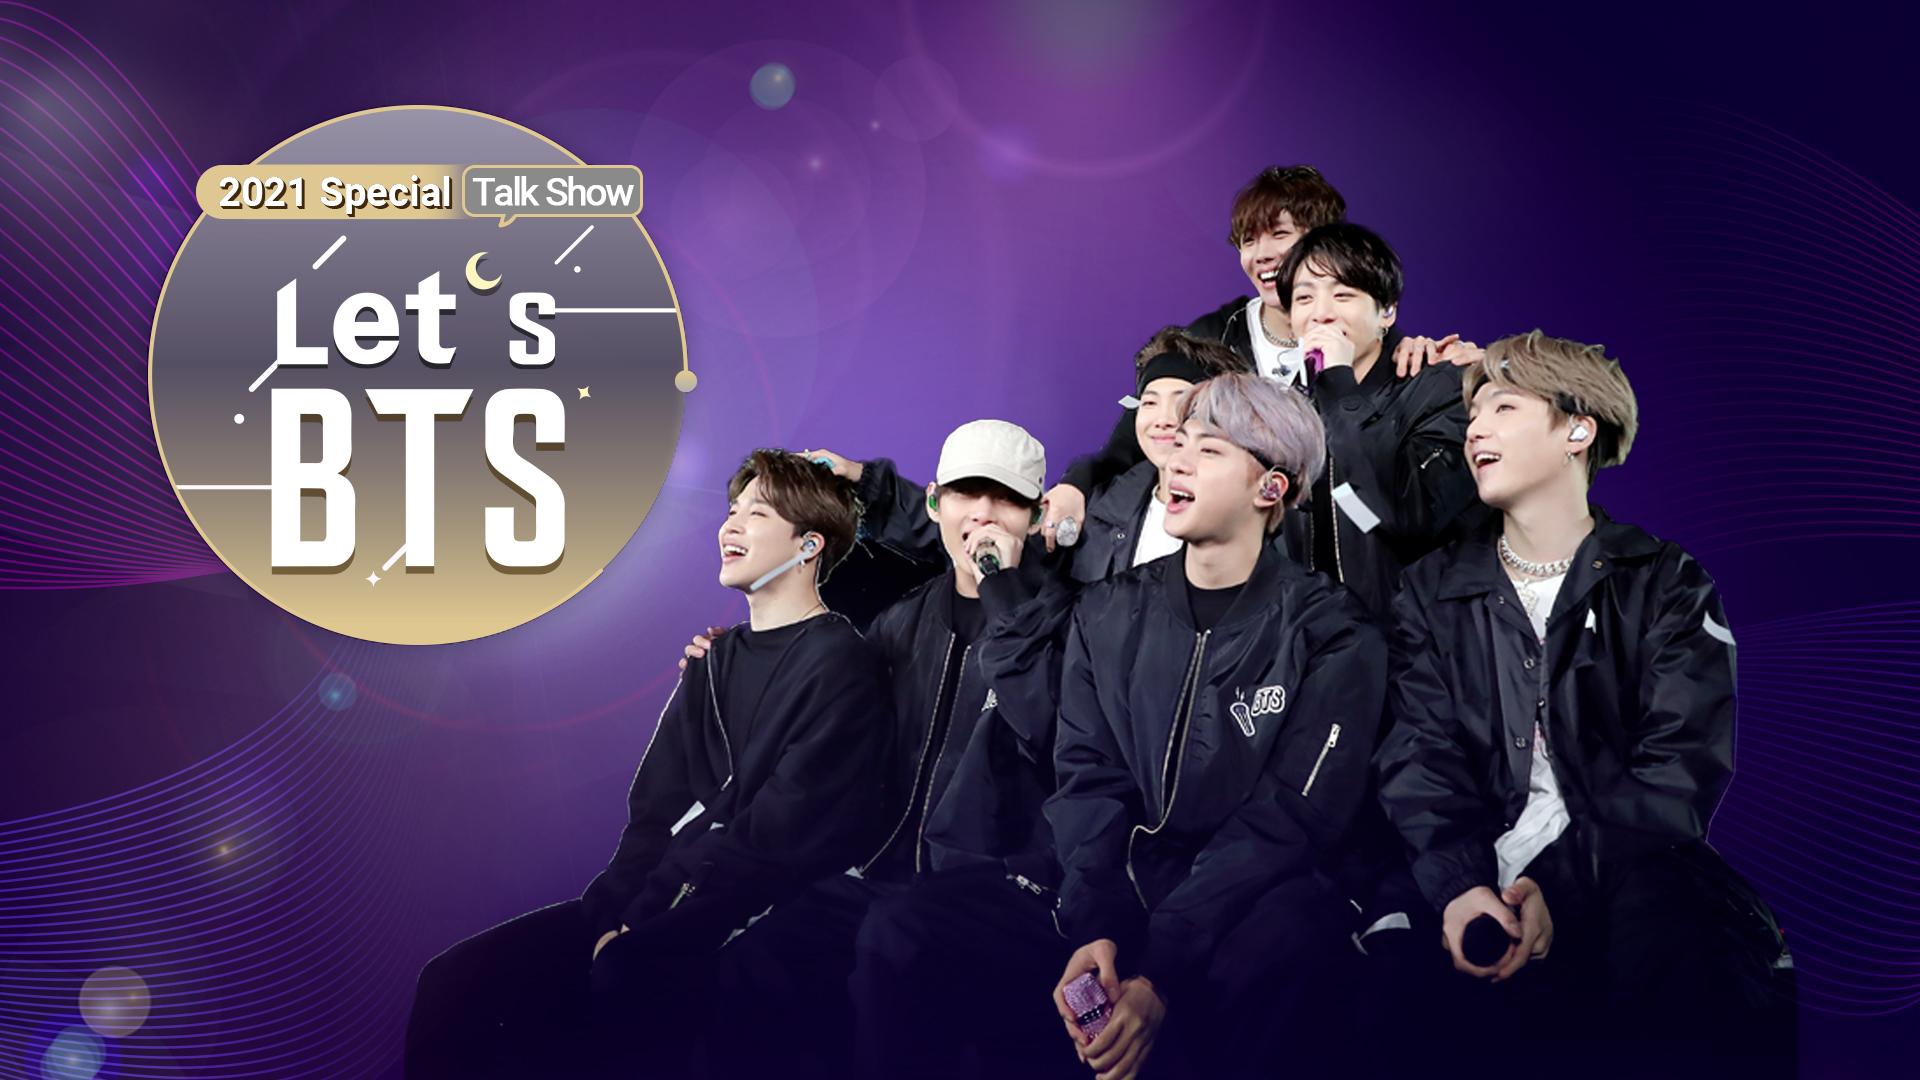 2021 Special Talk Show <Let's BTS>